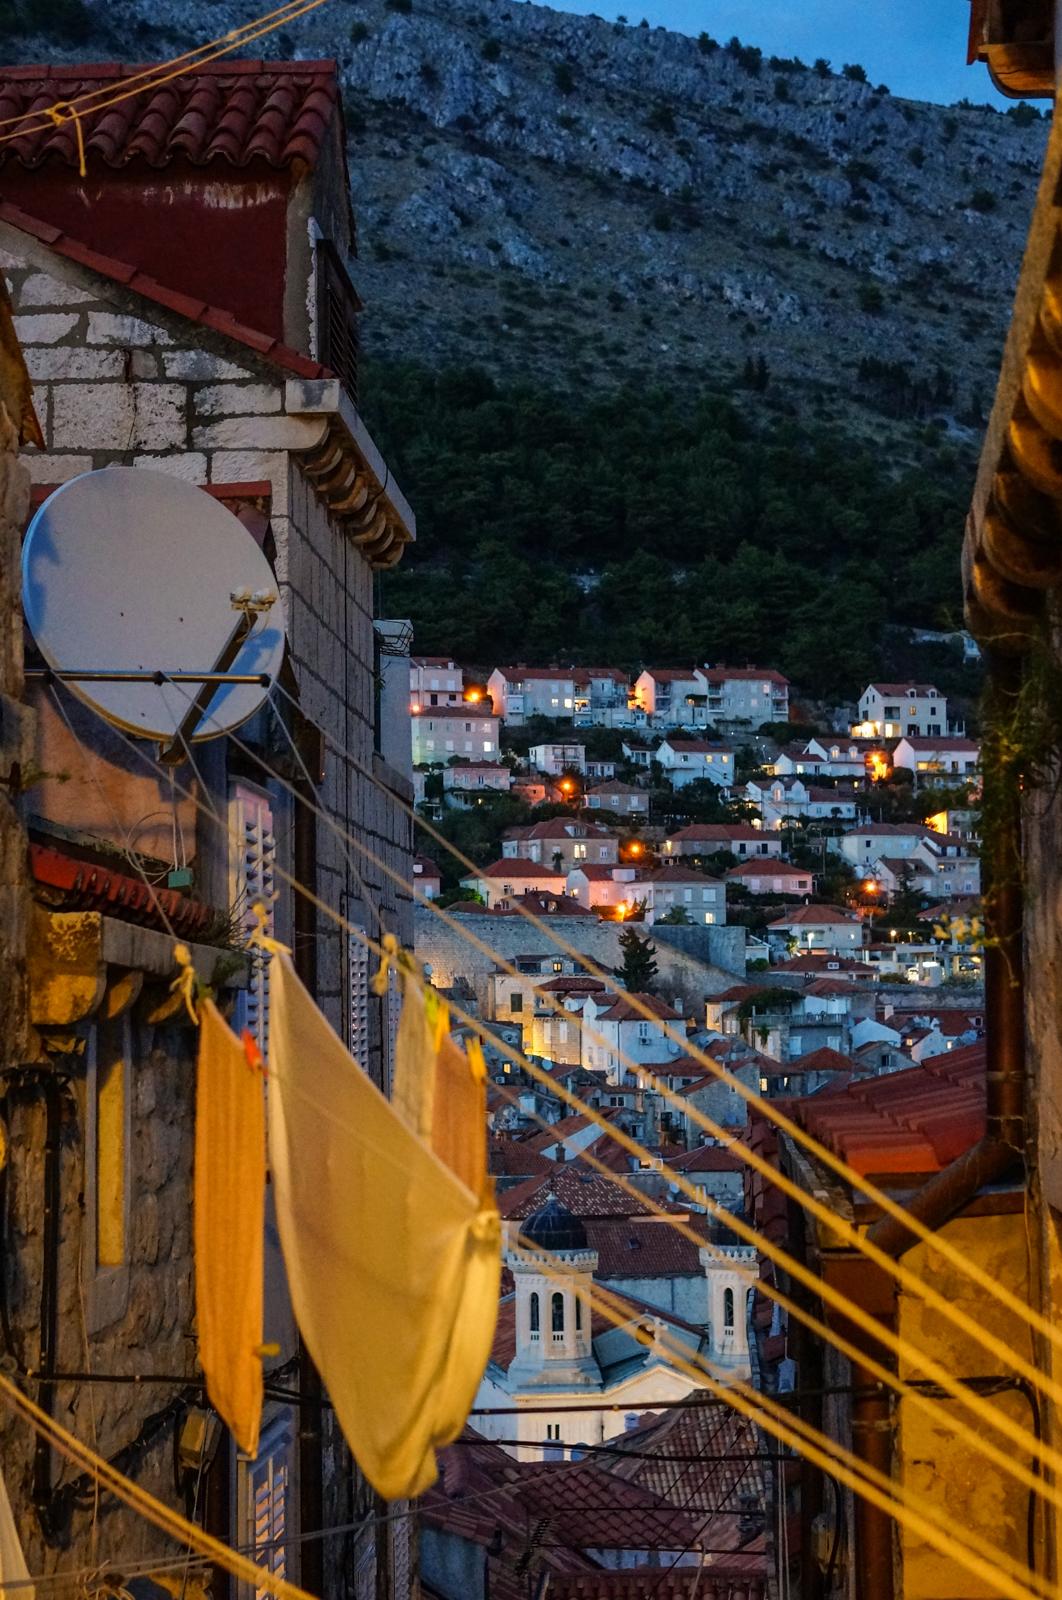 dubrovnik, tourisme dubrovnik, dubrovnik septembre, voyage croatie, blog voyage craotie, croatie 2017